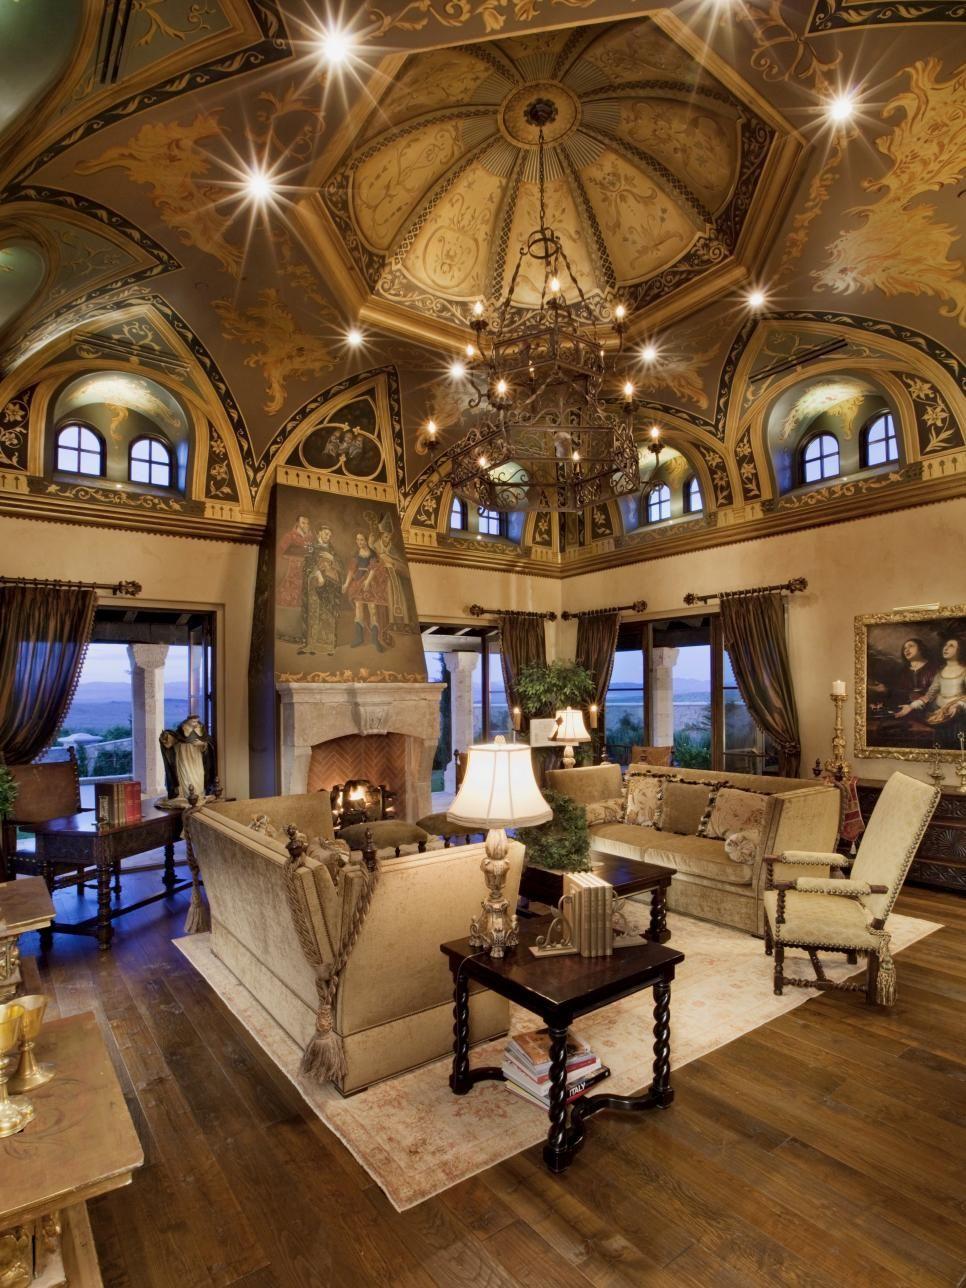 Nothing Short Of Magnificent This Old World Living Room Pulls In Elegant Italian Inspired Design Ele Living Room Design Styles House Interior Interior Design